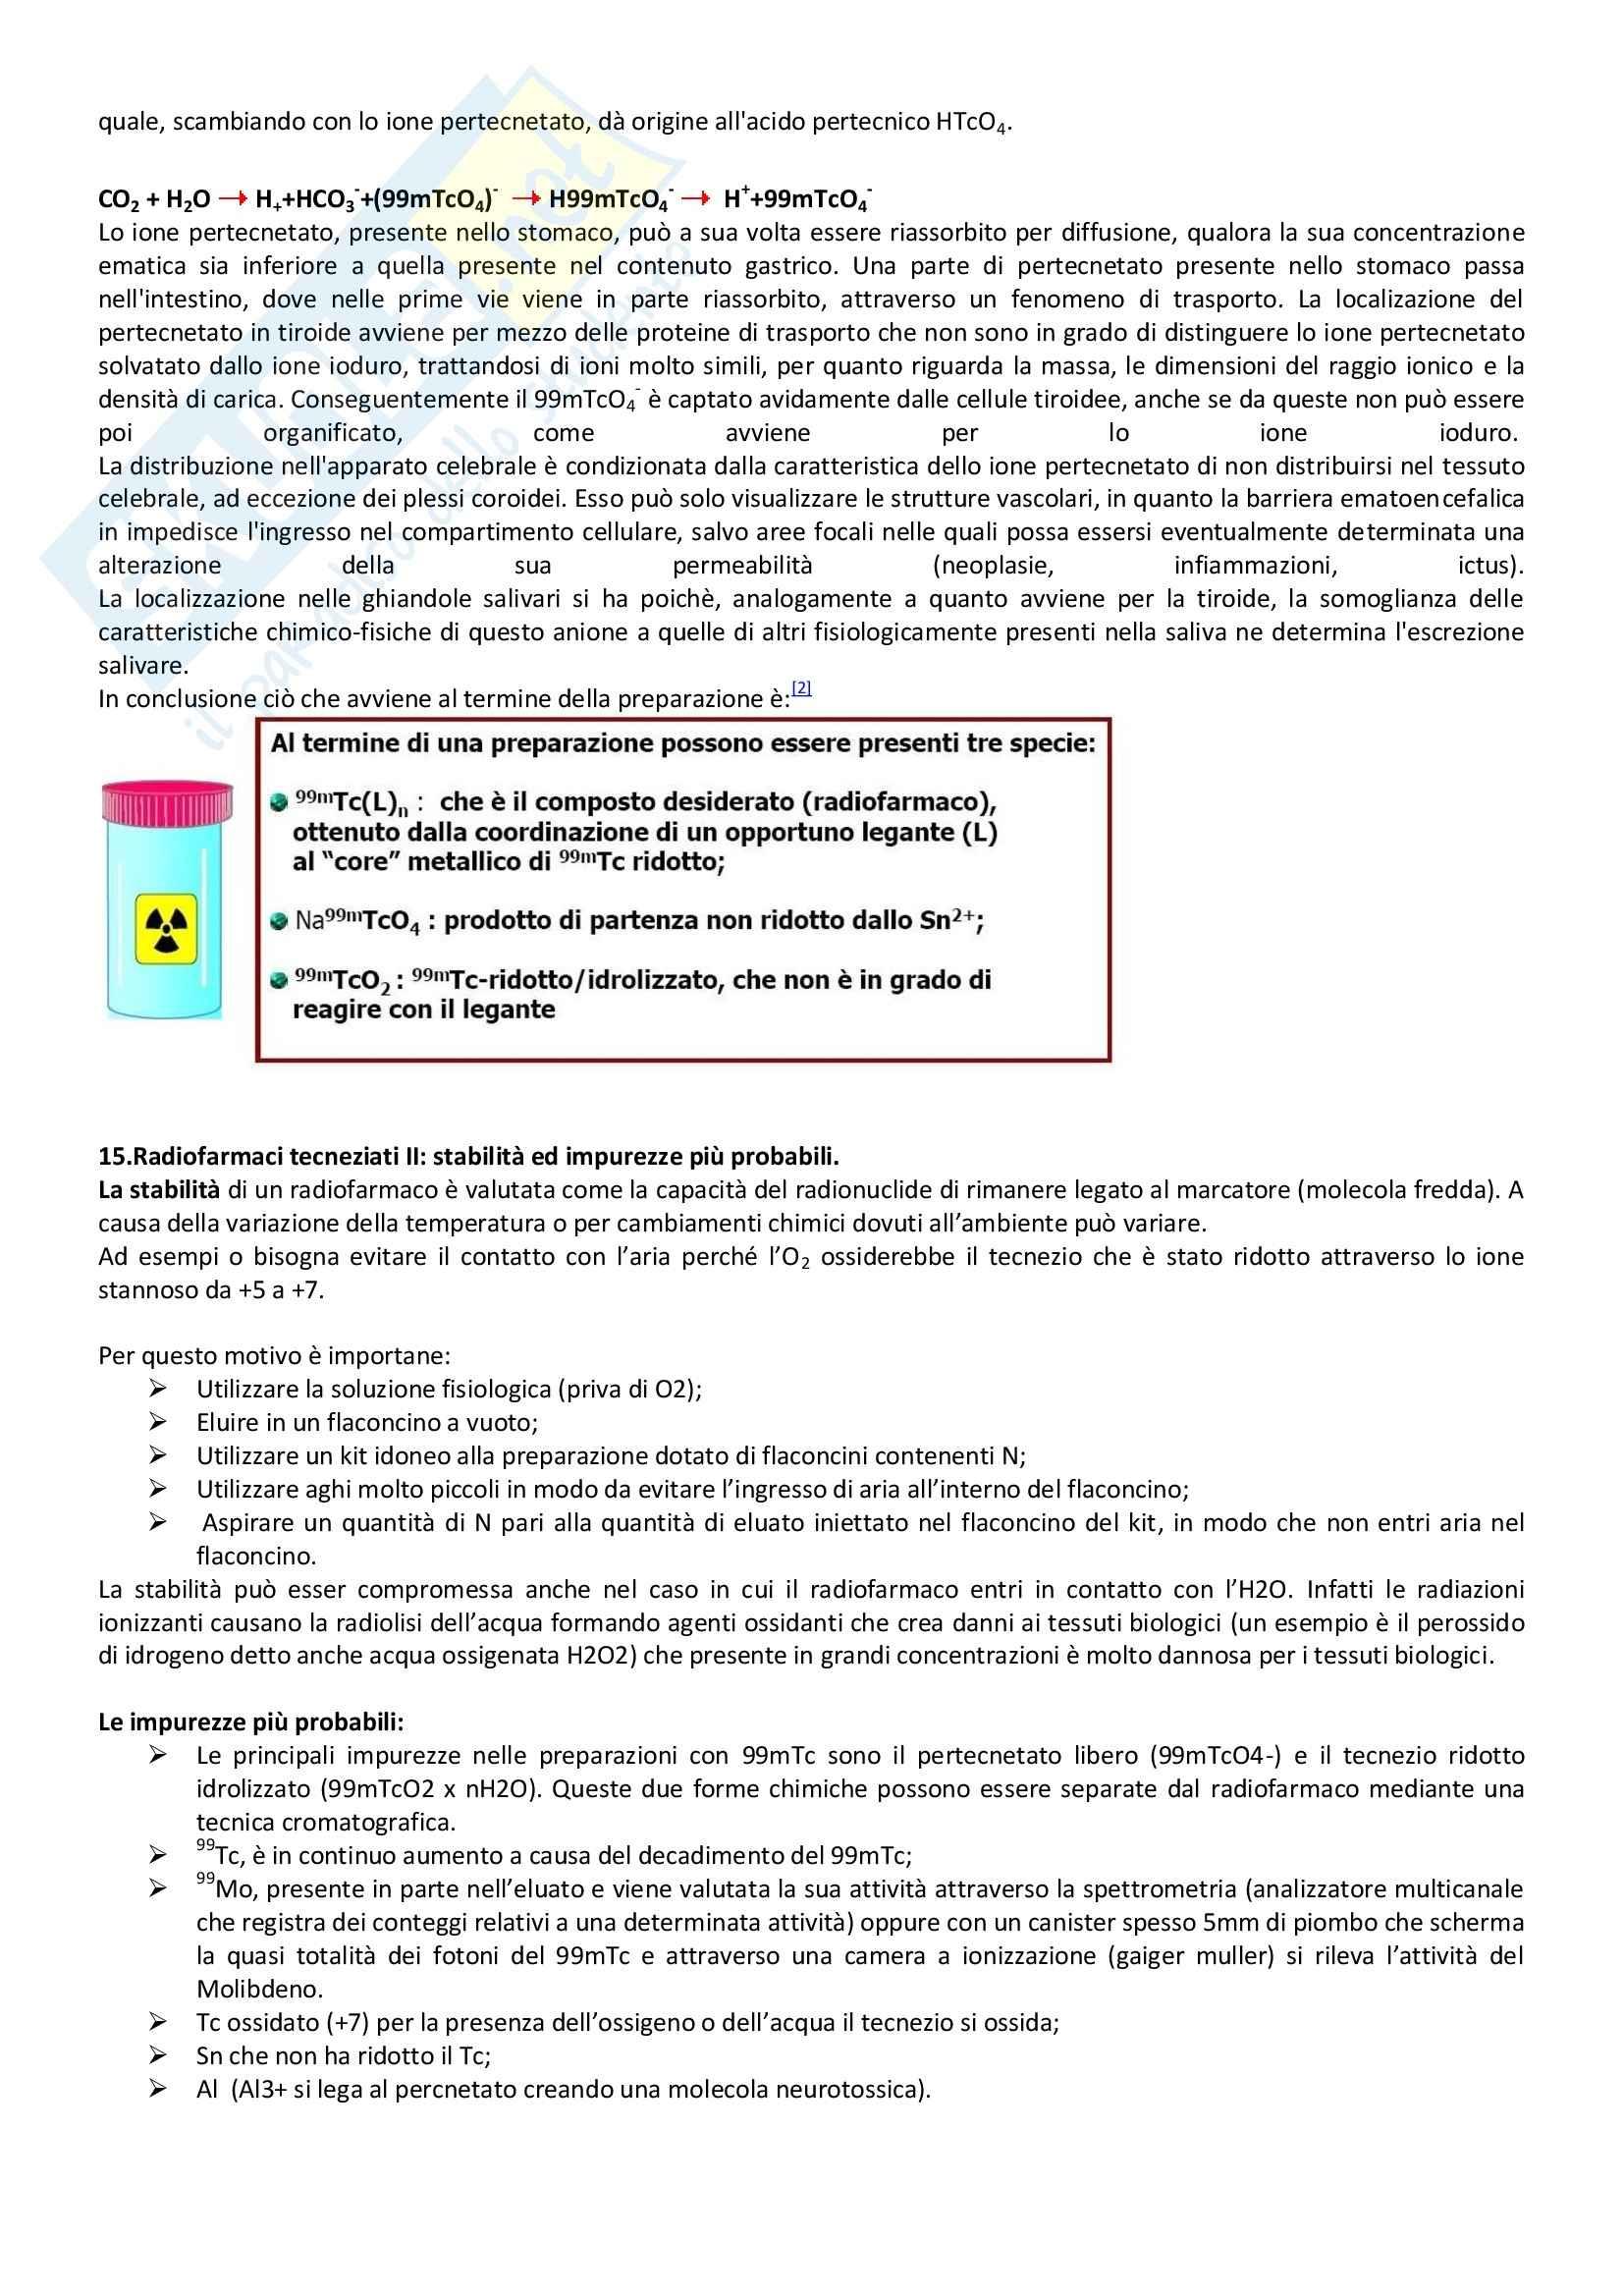 Medicina nucleare I - Appunti Pag. 11